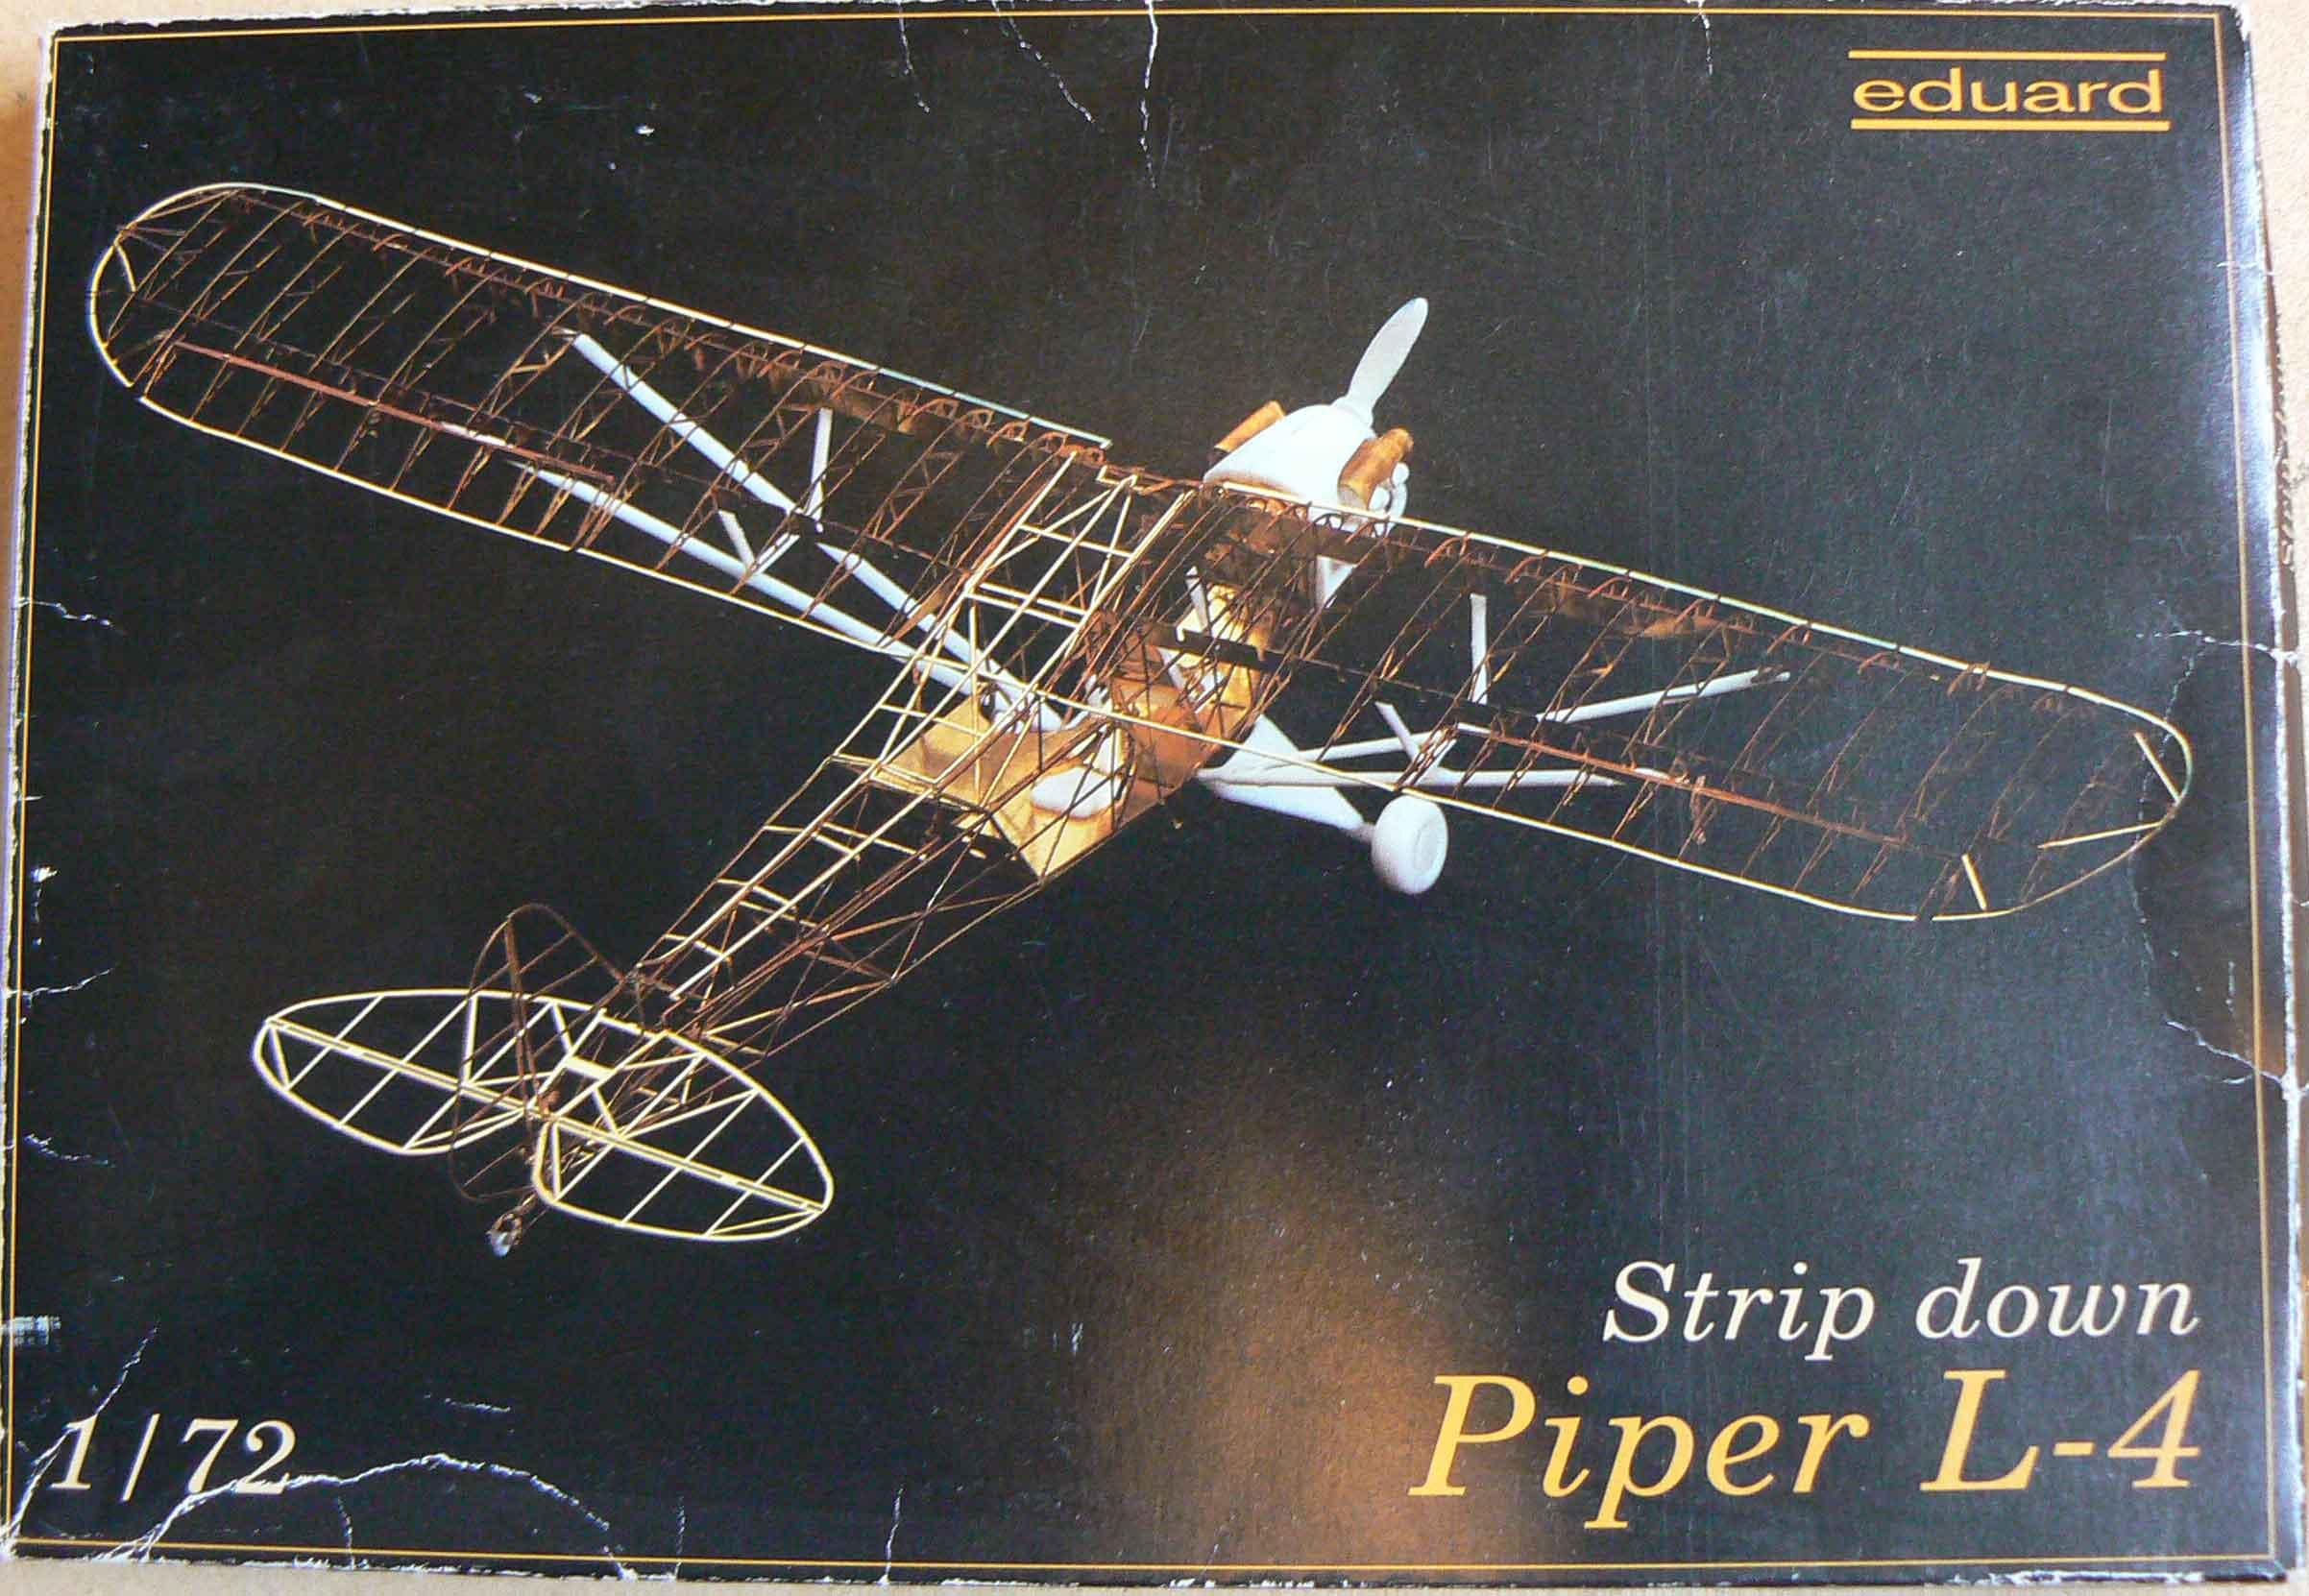 L4 Piper Eduard 1/72 HBklPk